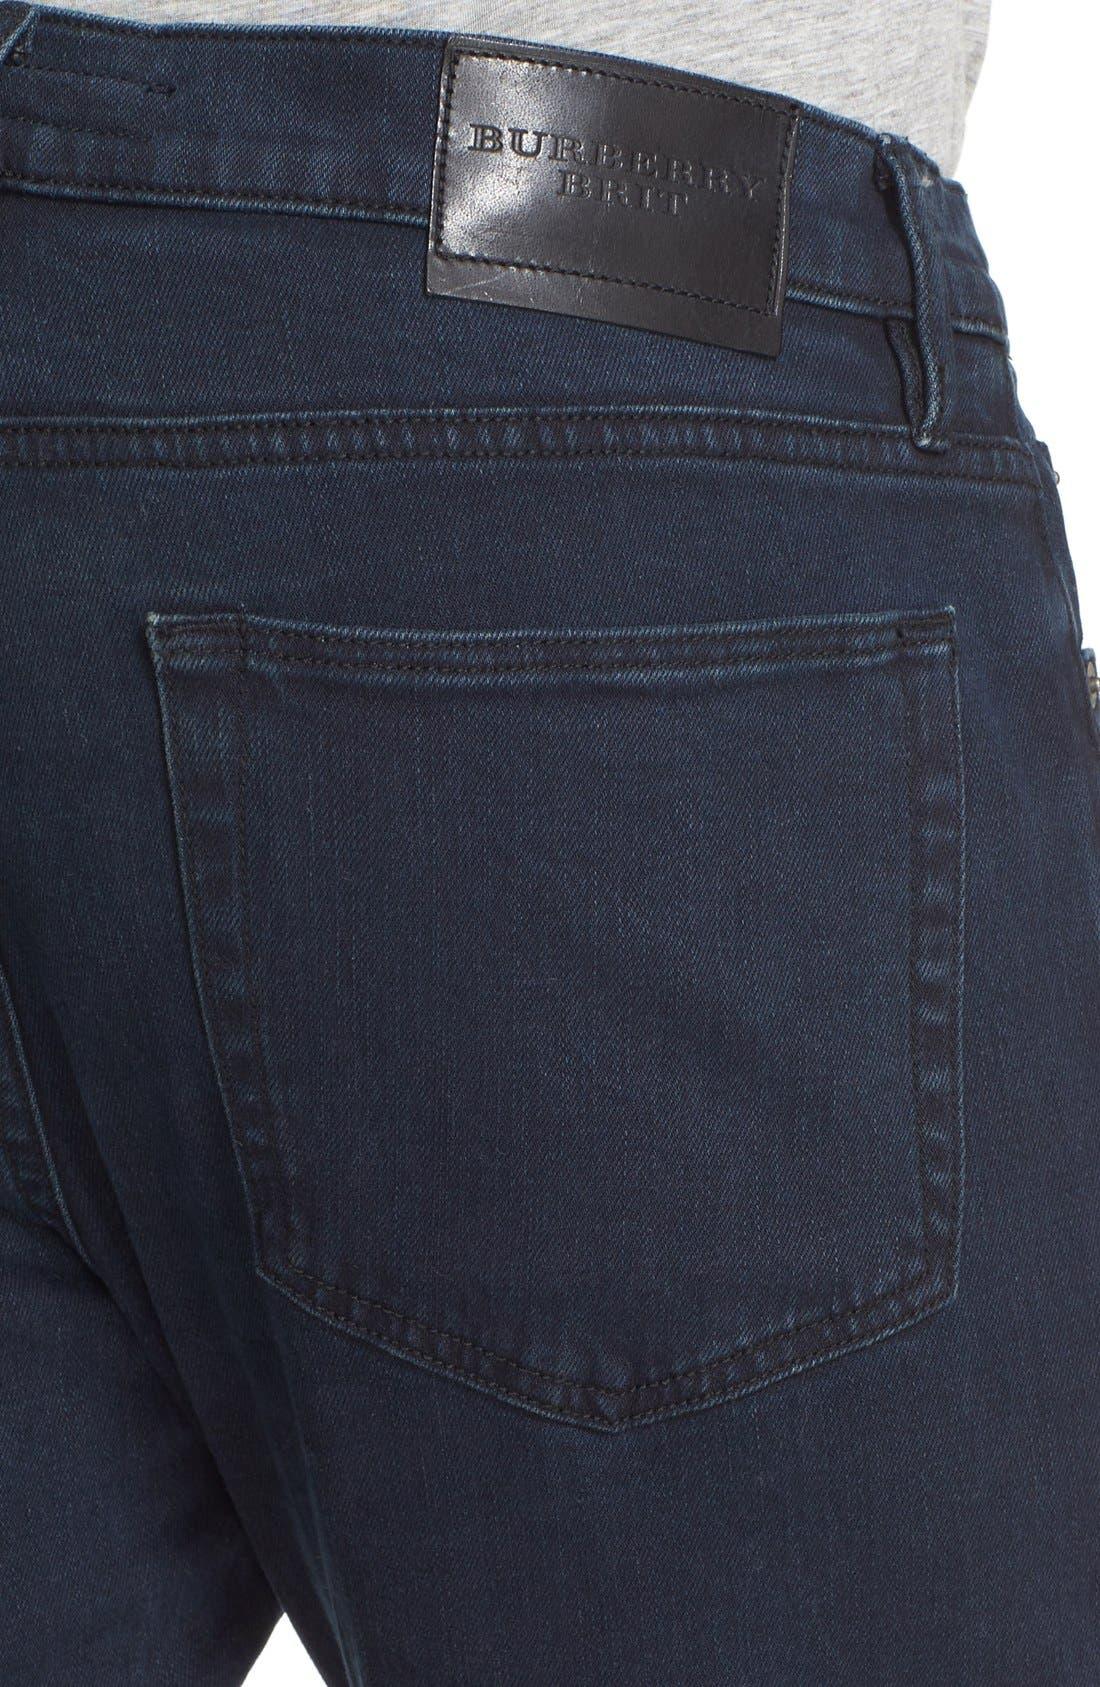 Straight Leg Jeans Jeans,                             Alternate thumbnail 4, color,                             Dark Indigo